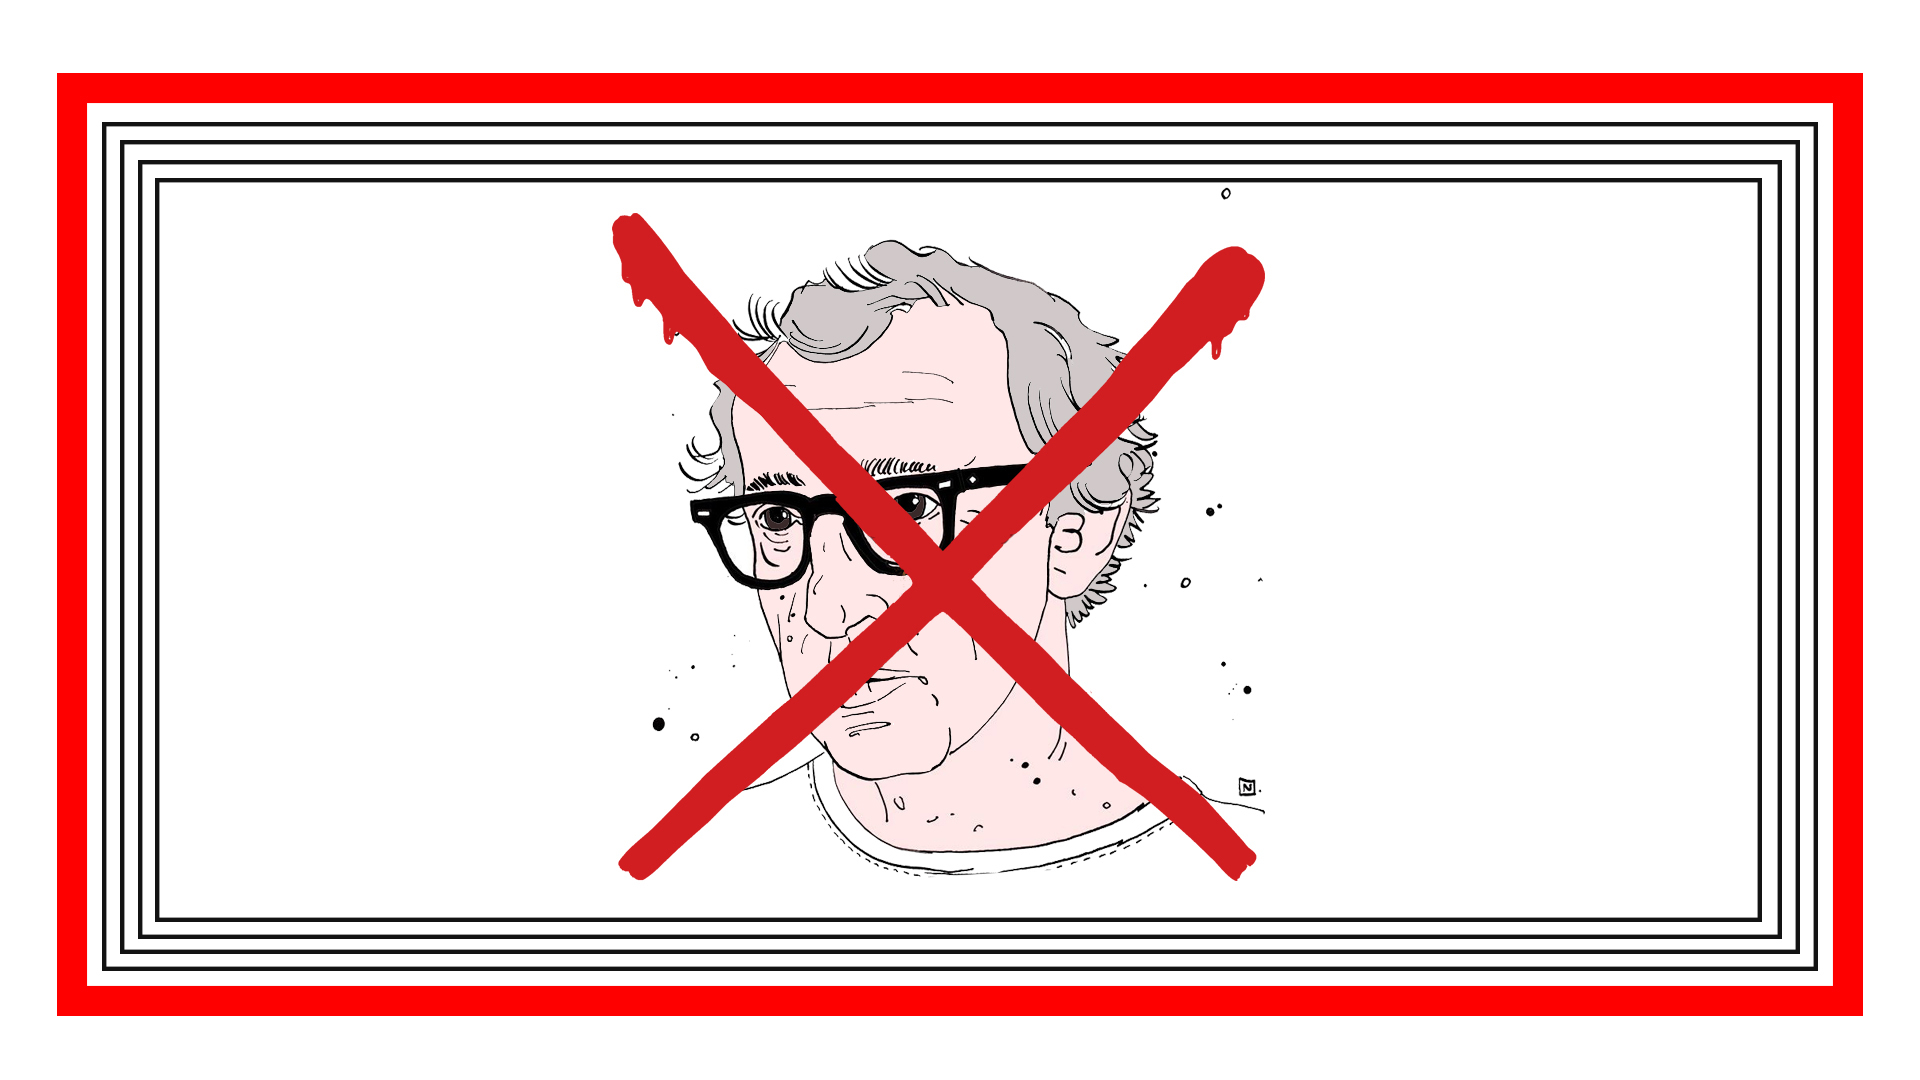 Woody Allen Soit dit en passant Apropos of nothing livre